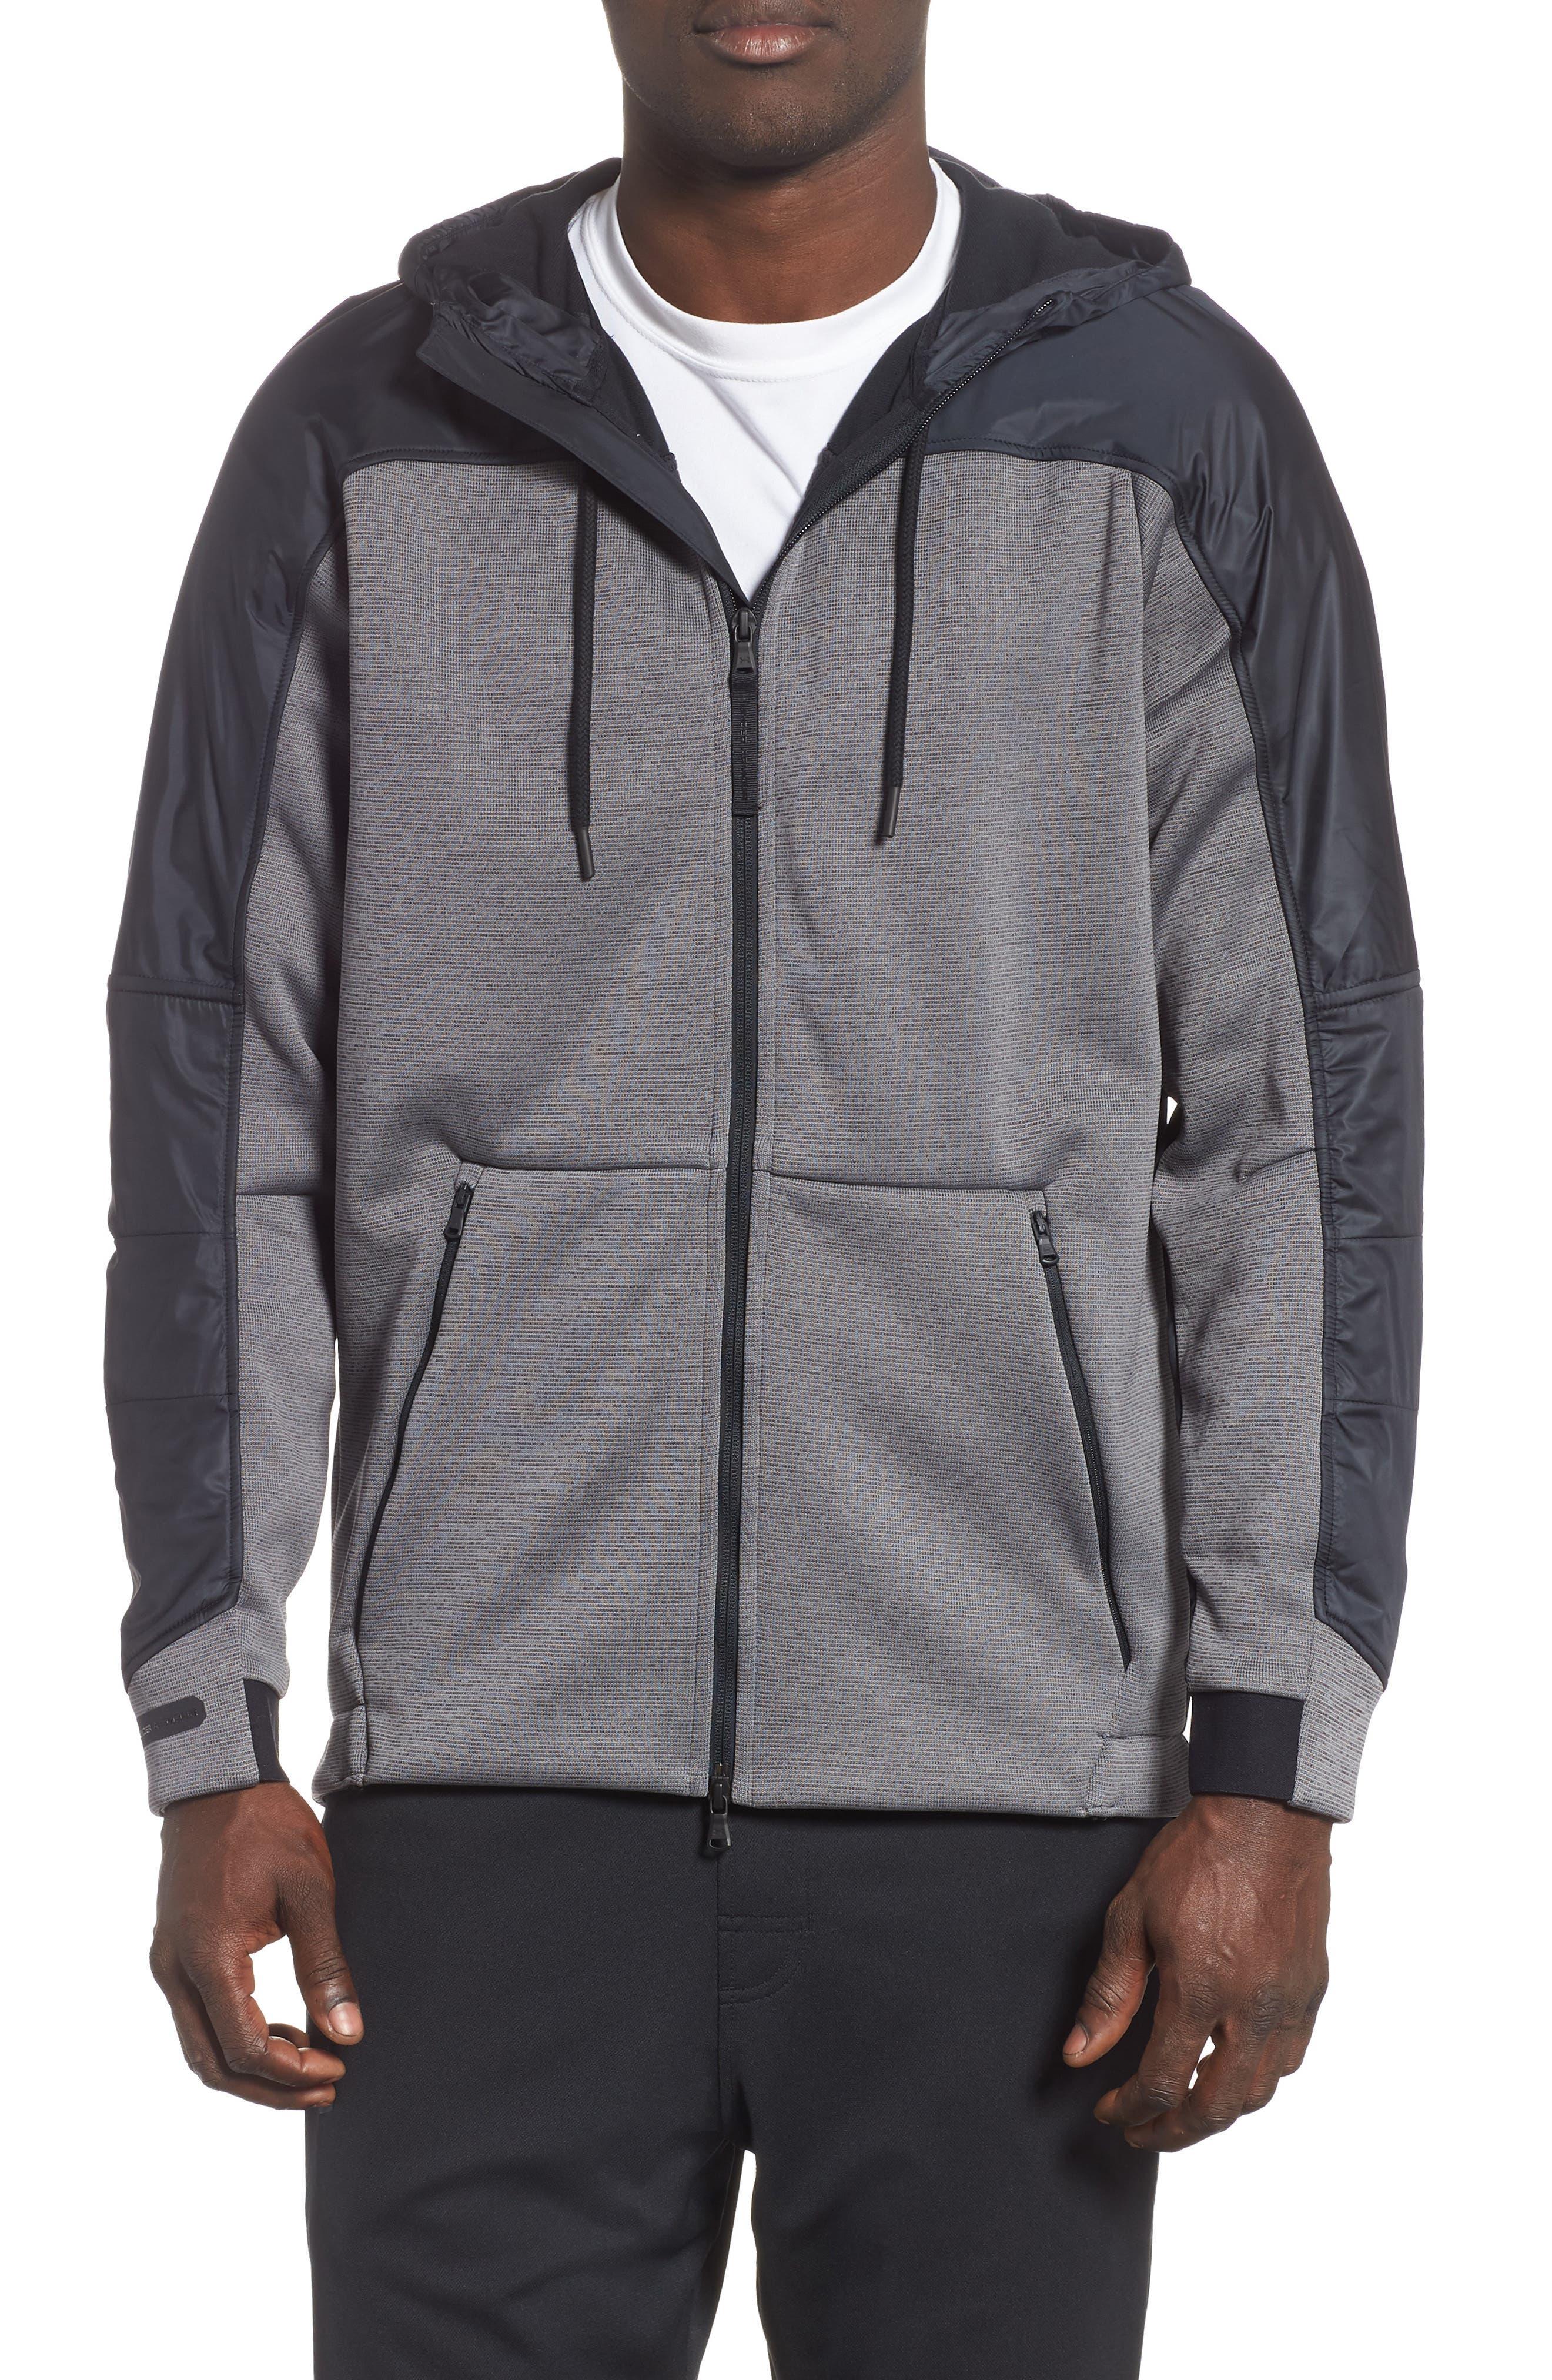 Unstoppable ColdGear<sup>®</sup> Jacket,                         Main,                         color, CHARCOAL/ BLACK